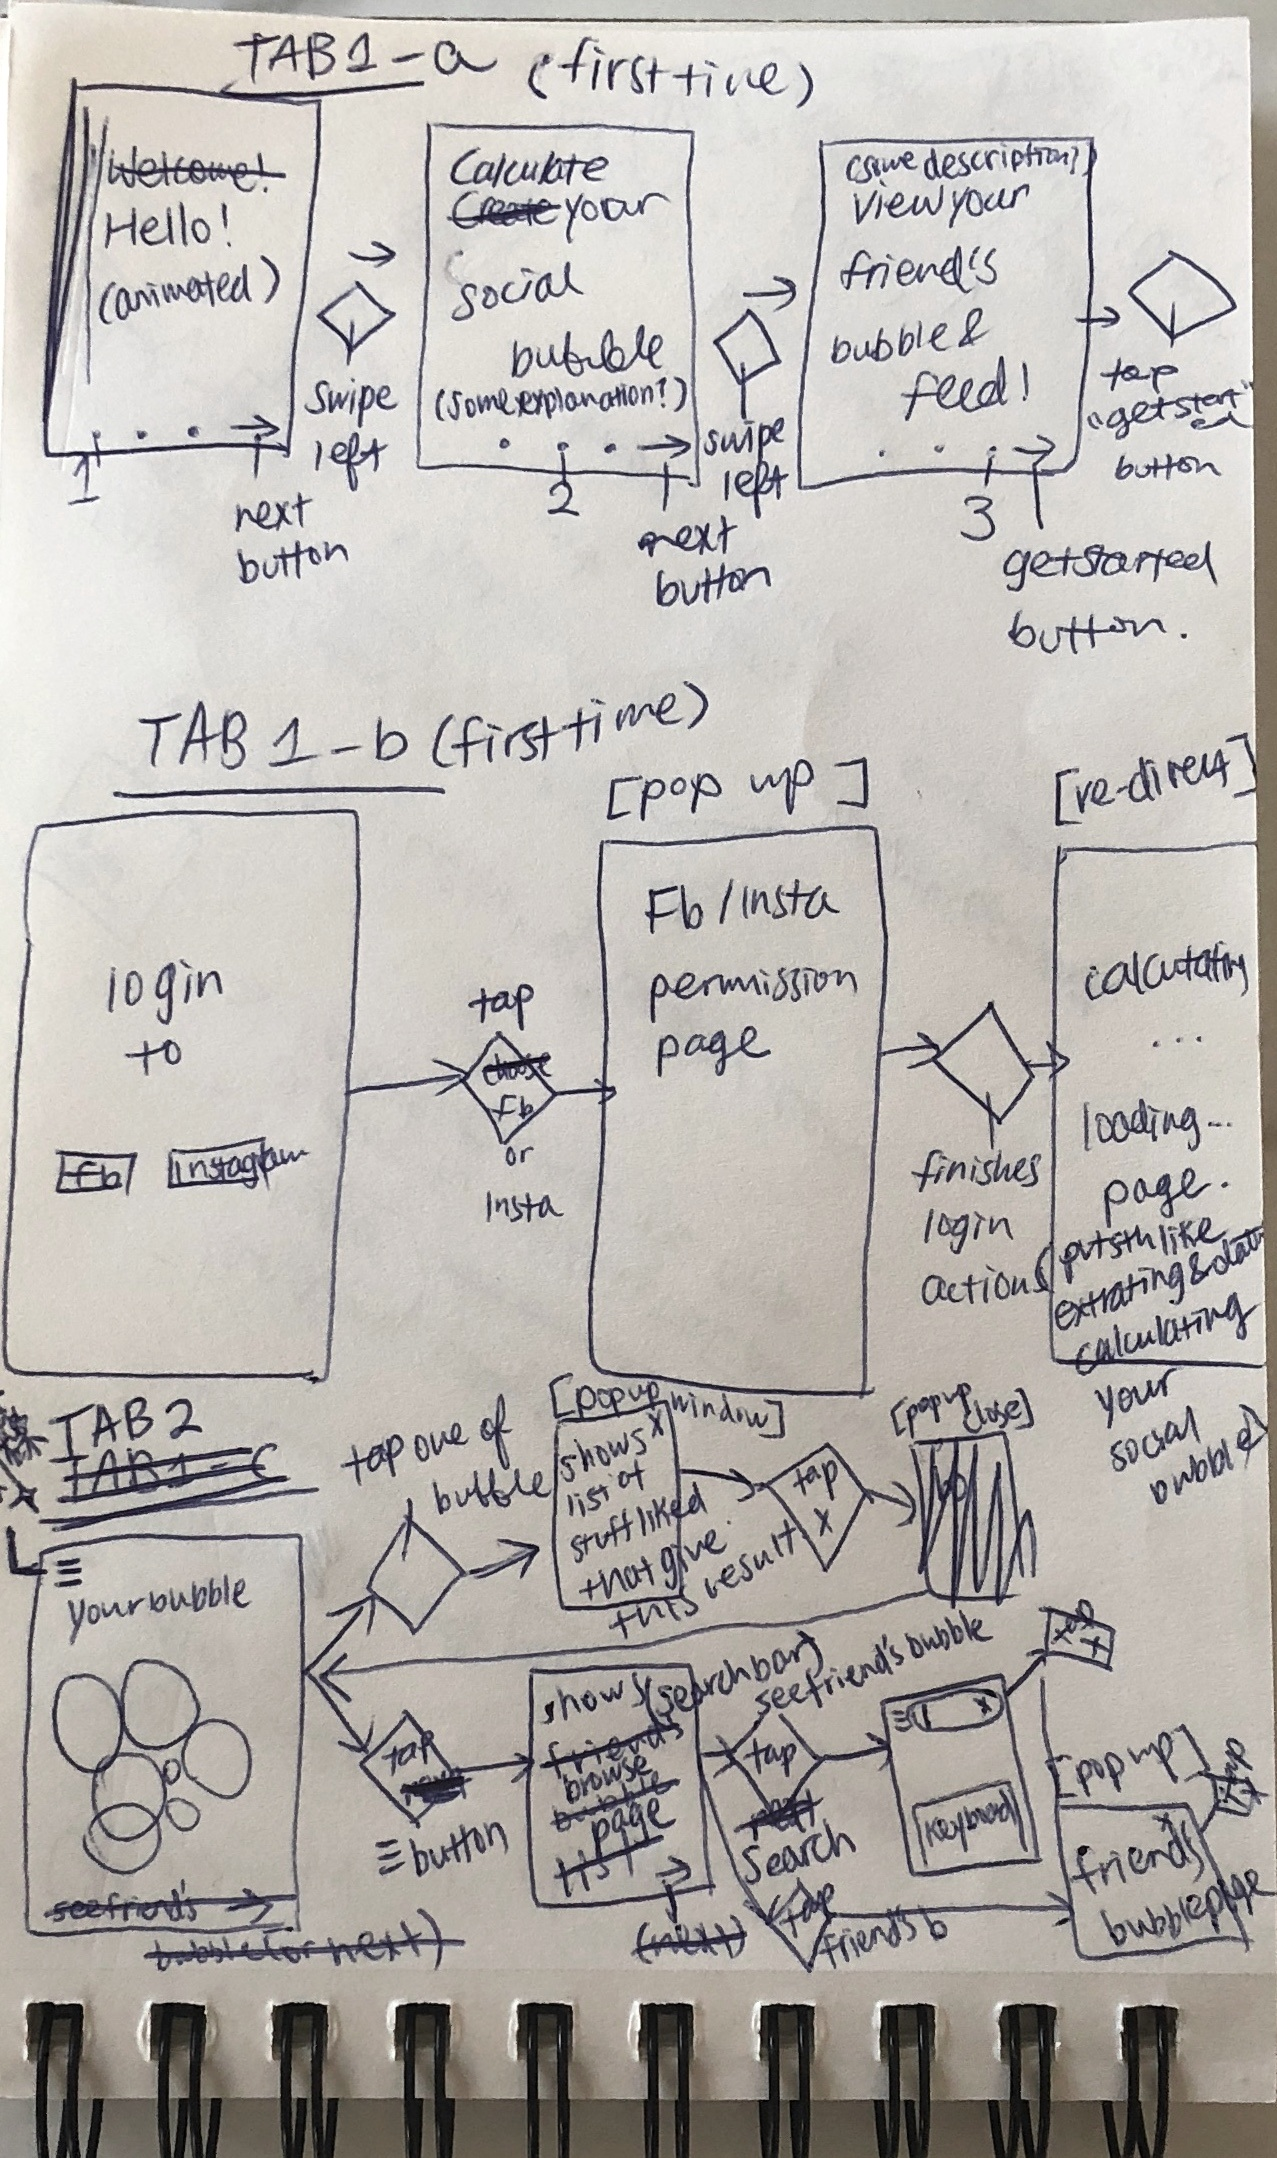 Sketch of user flow diagram 1.